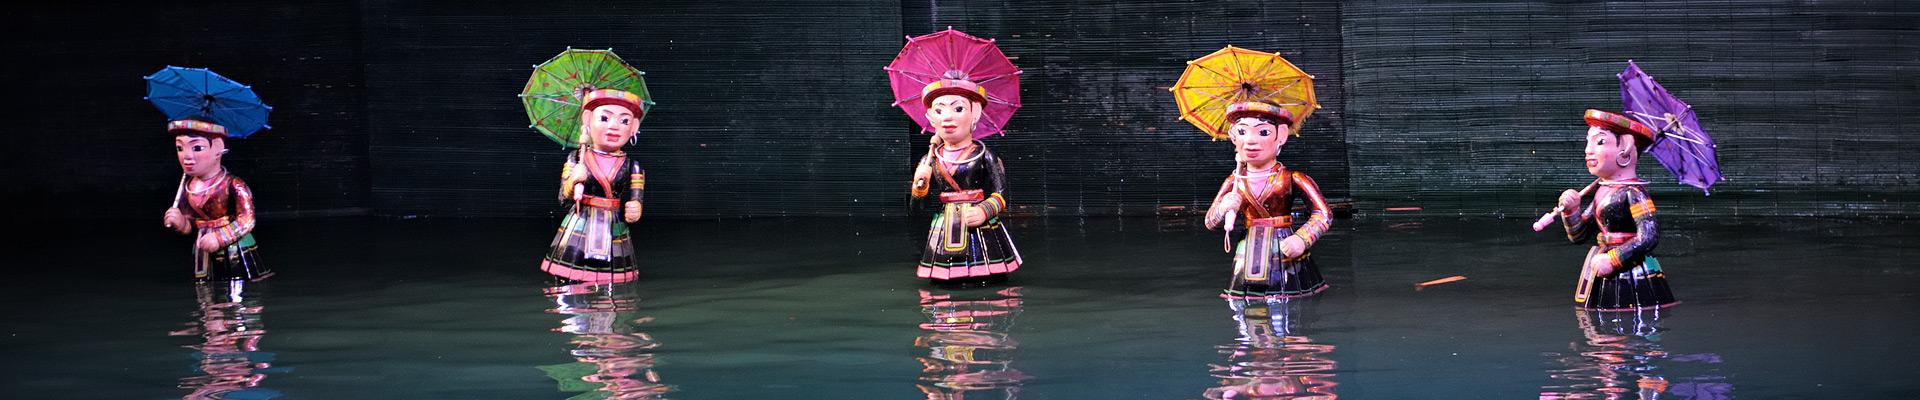 Top image marionnettes Hanoi, Vietnam